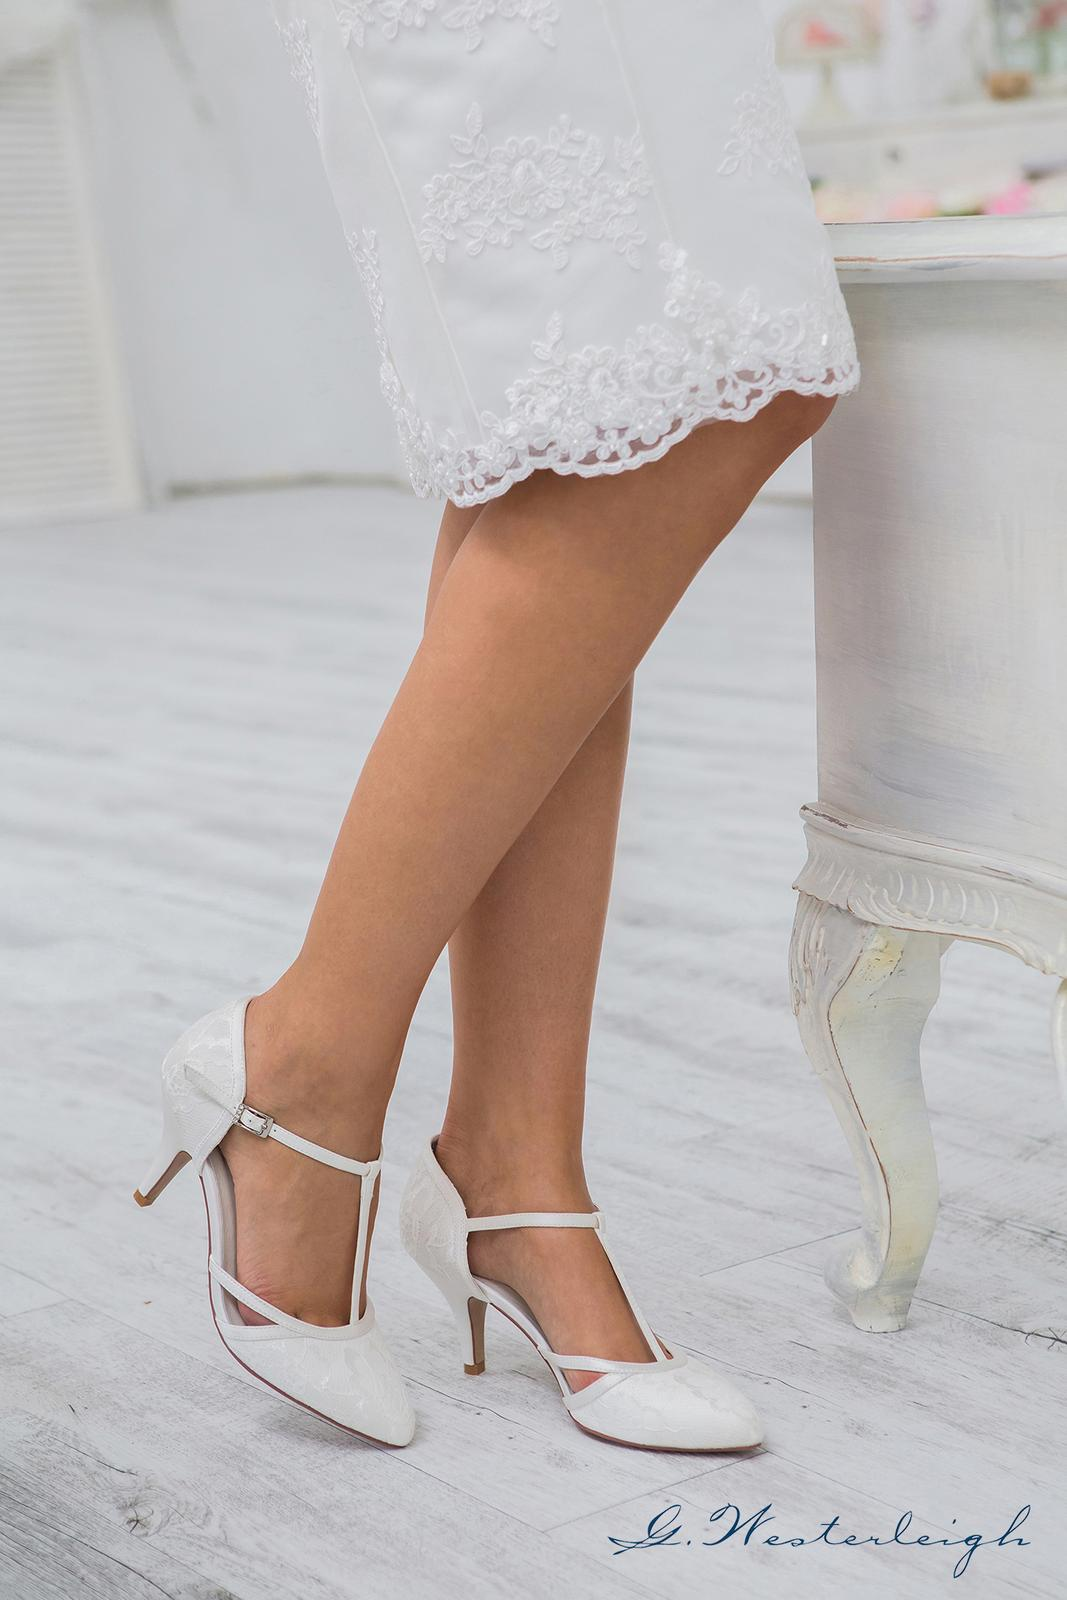 Svadobné topánky Jasmine - Obrázok č. 4